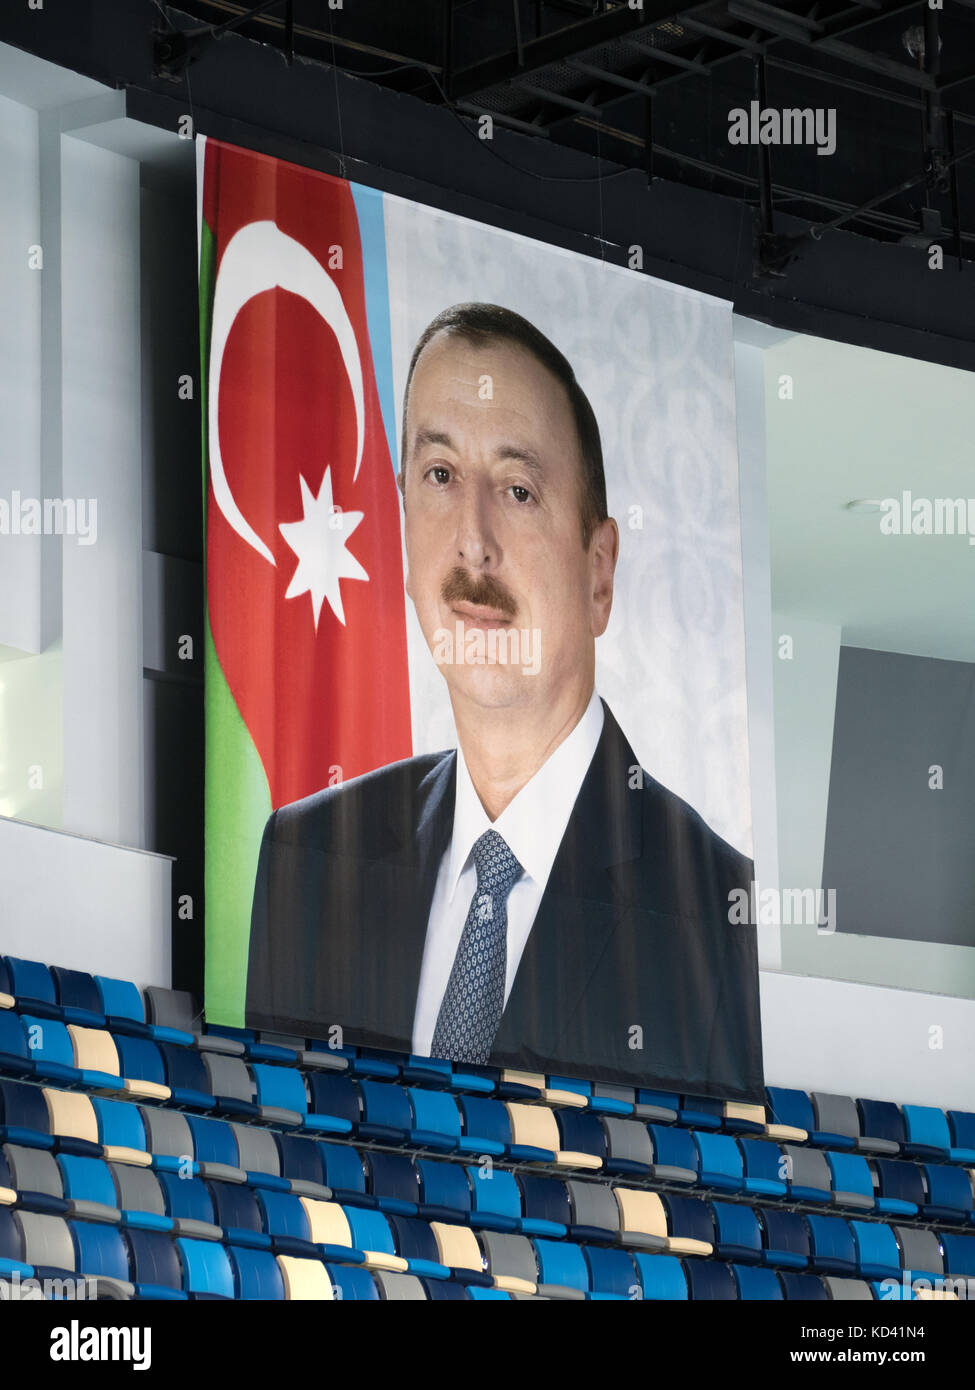 Poster of Ilham Aliyev, President of Azerbaijan, inside Heydar Aliyev Sports Arena Stock Photo